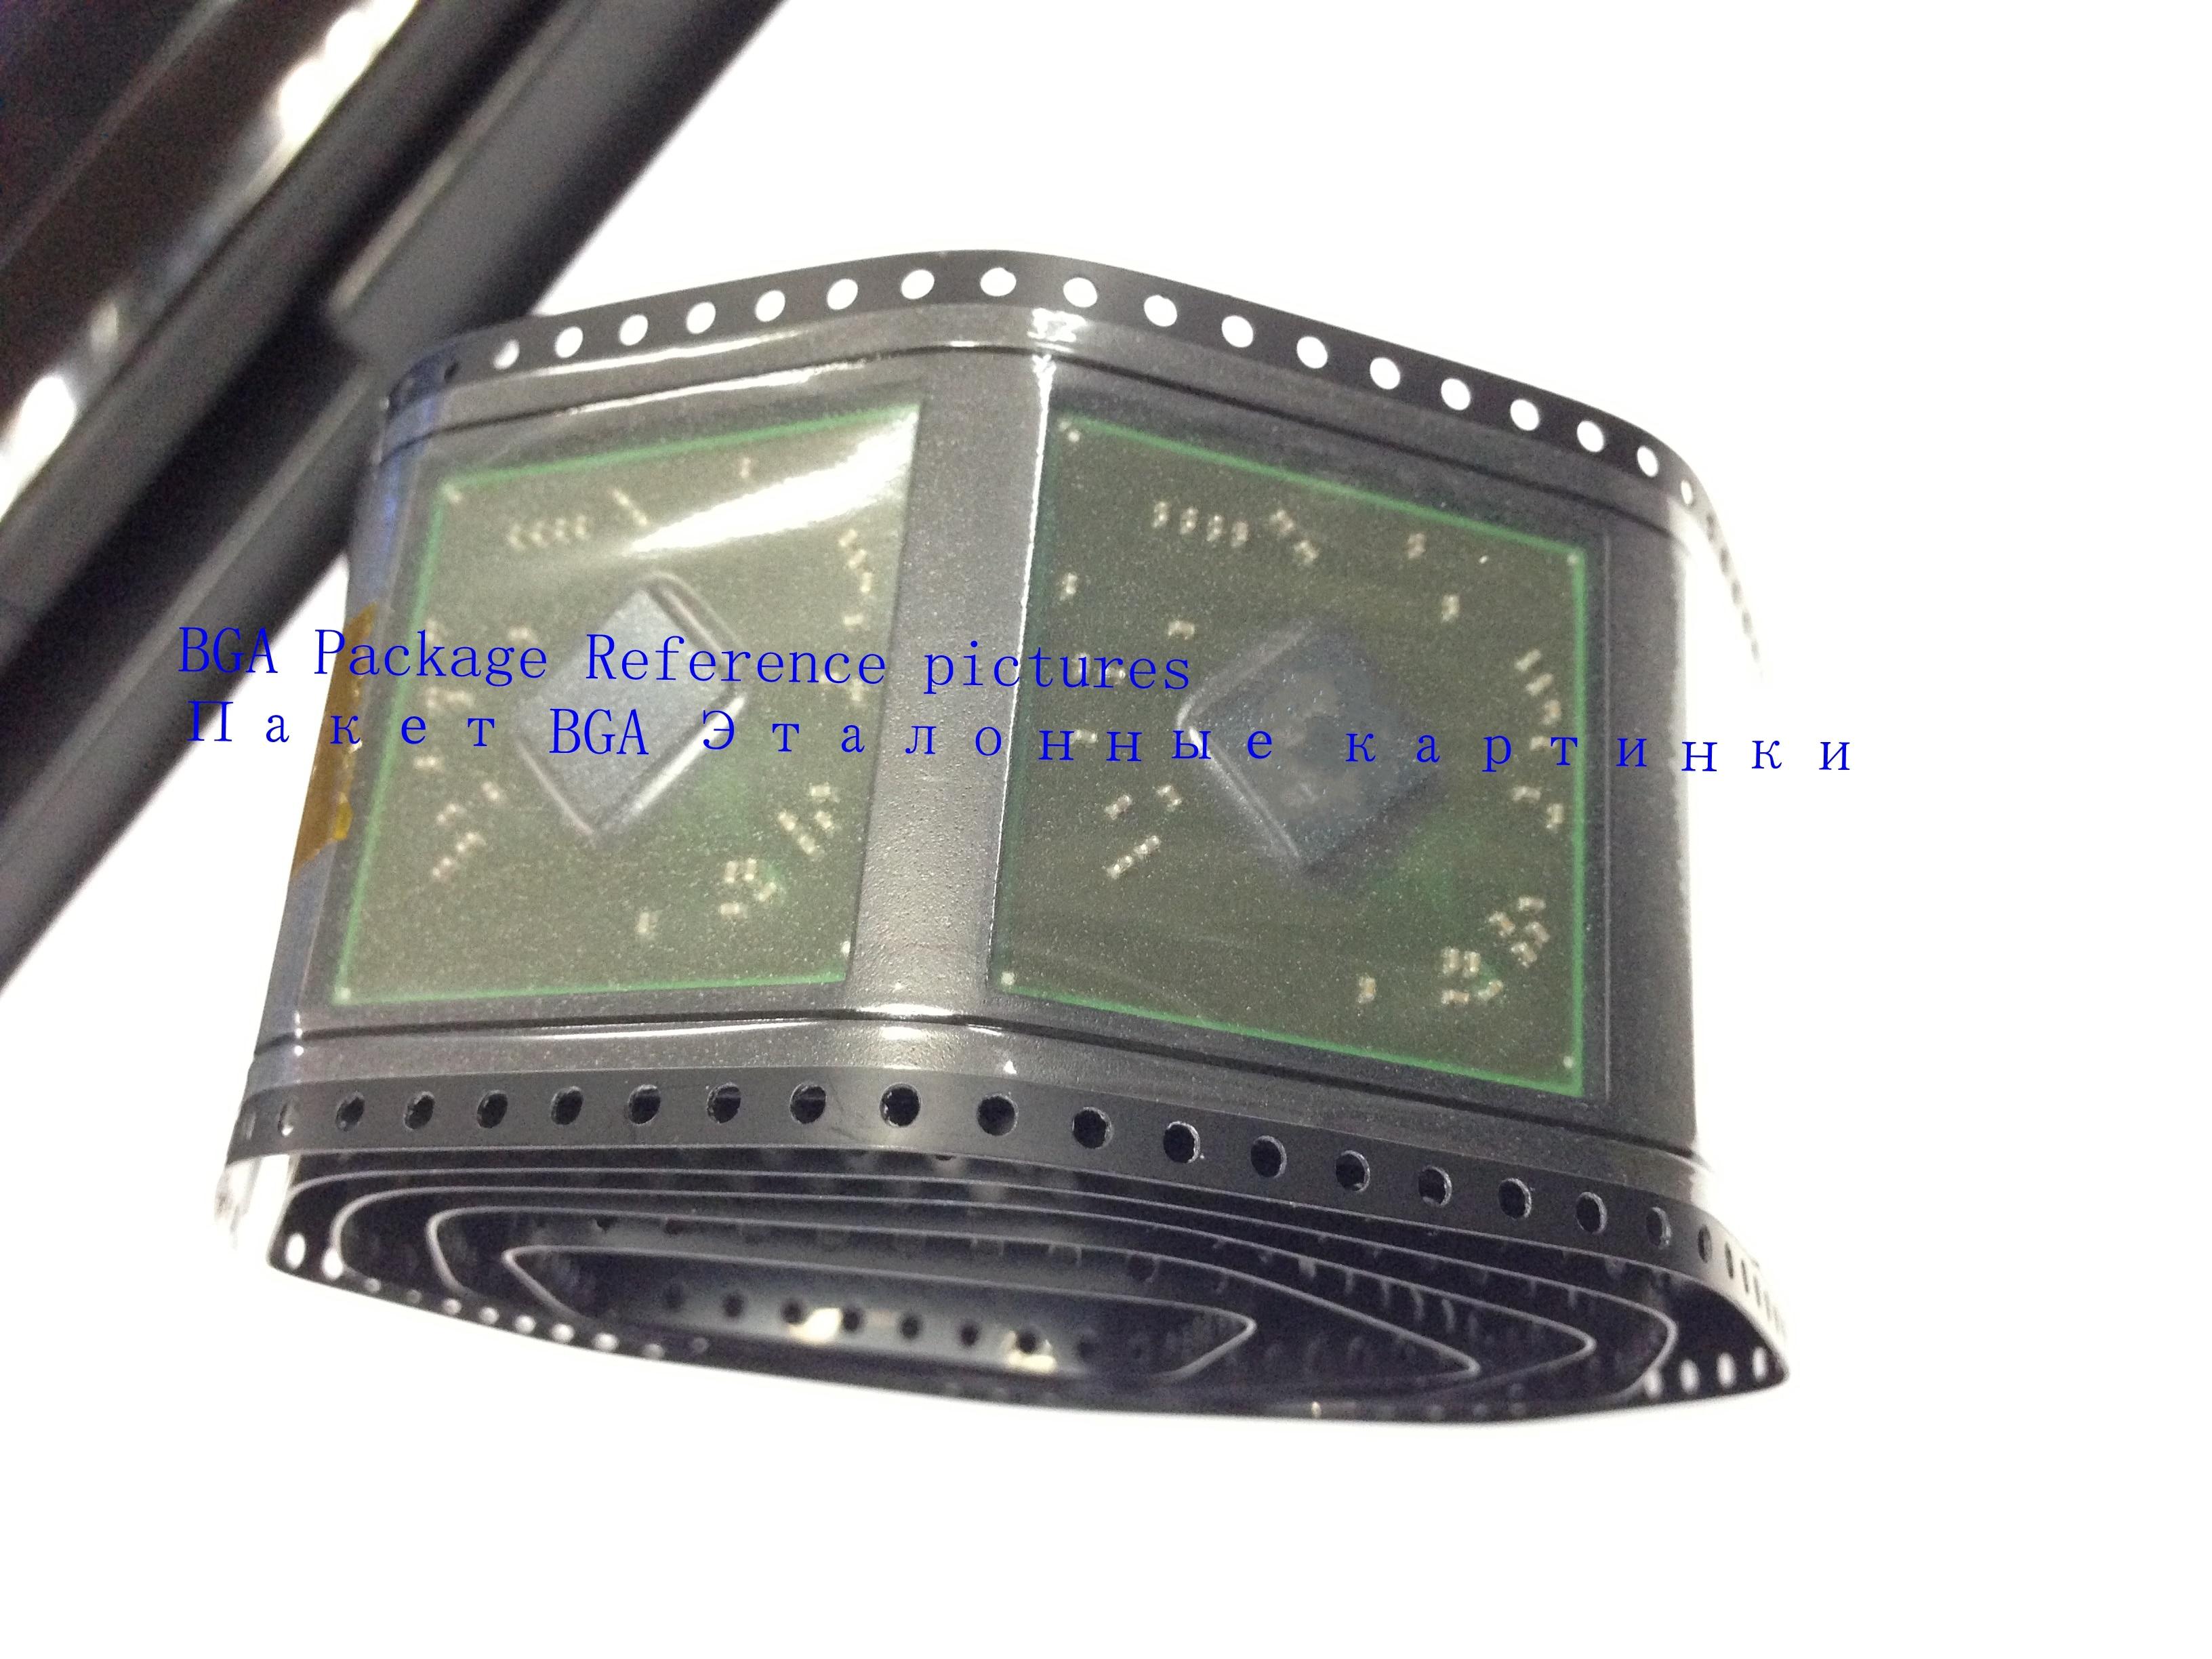 1 pcs/lot 100% Nouveau N15P-GX-A2 N15P GX A2 Chipset BGA1 pcs/lot 100% Nouveau N15P-GX-A2 N15P GX A2 Chipset BGA